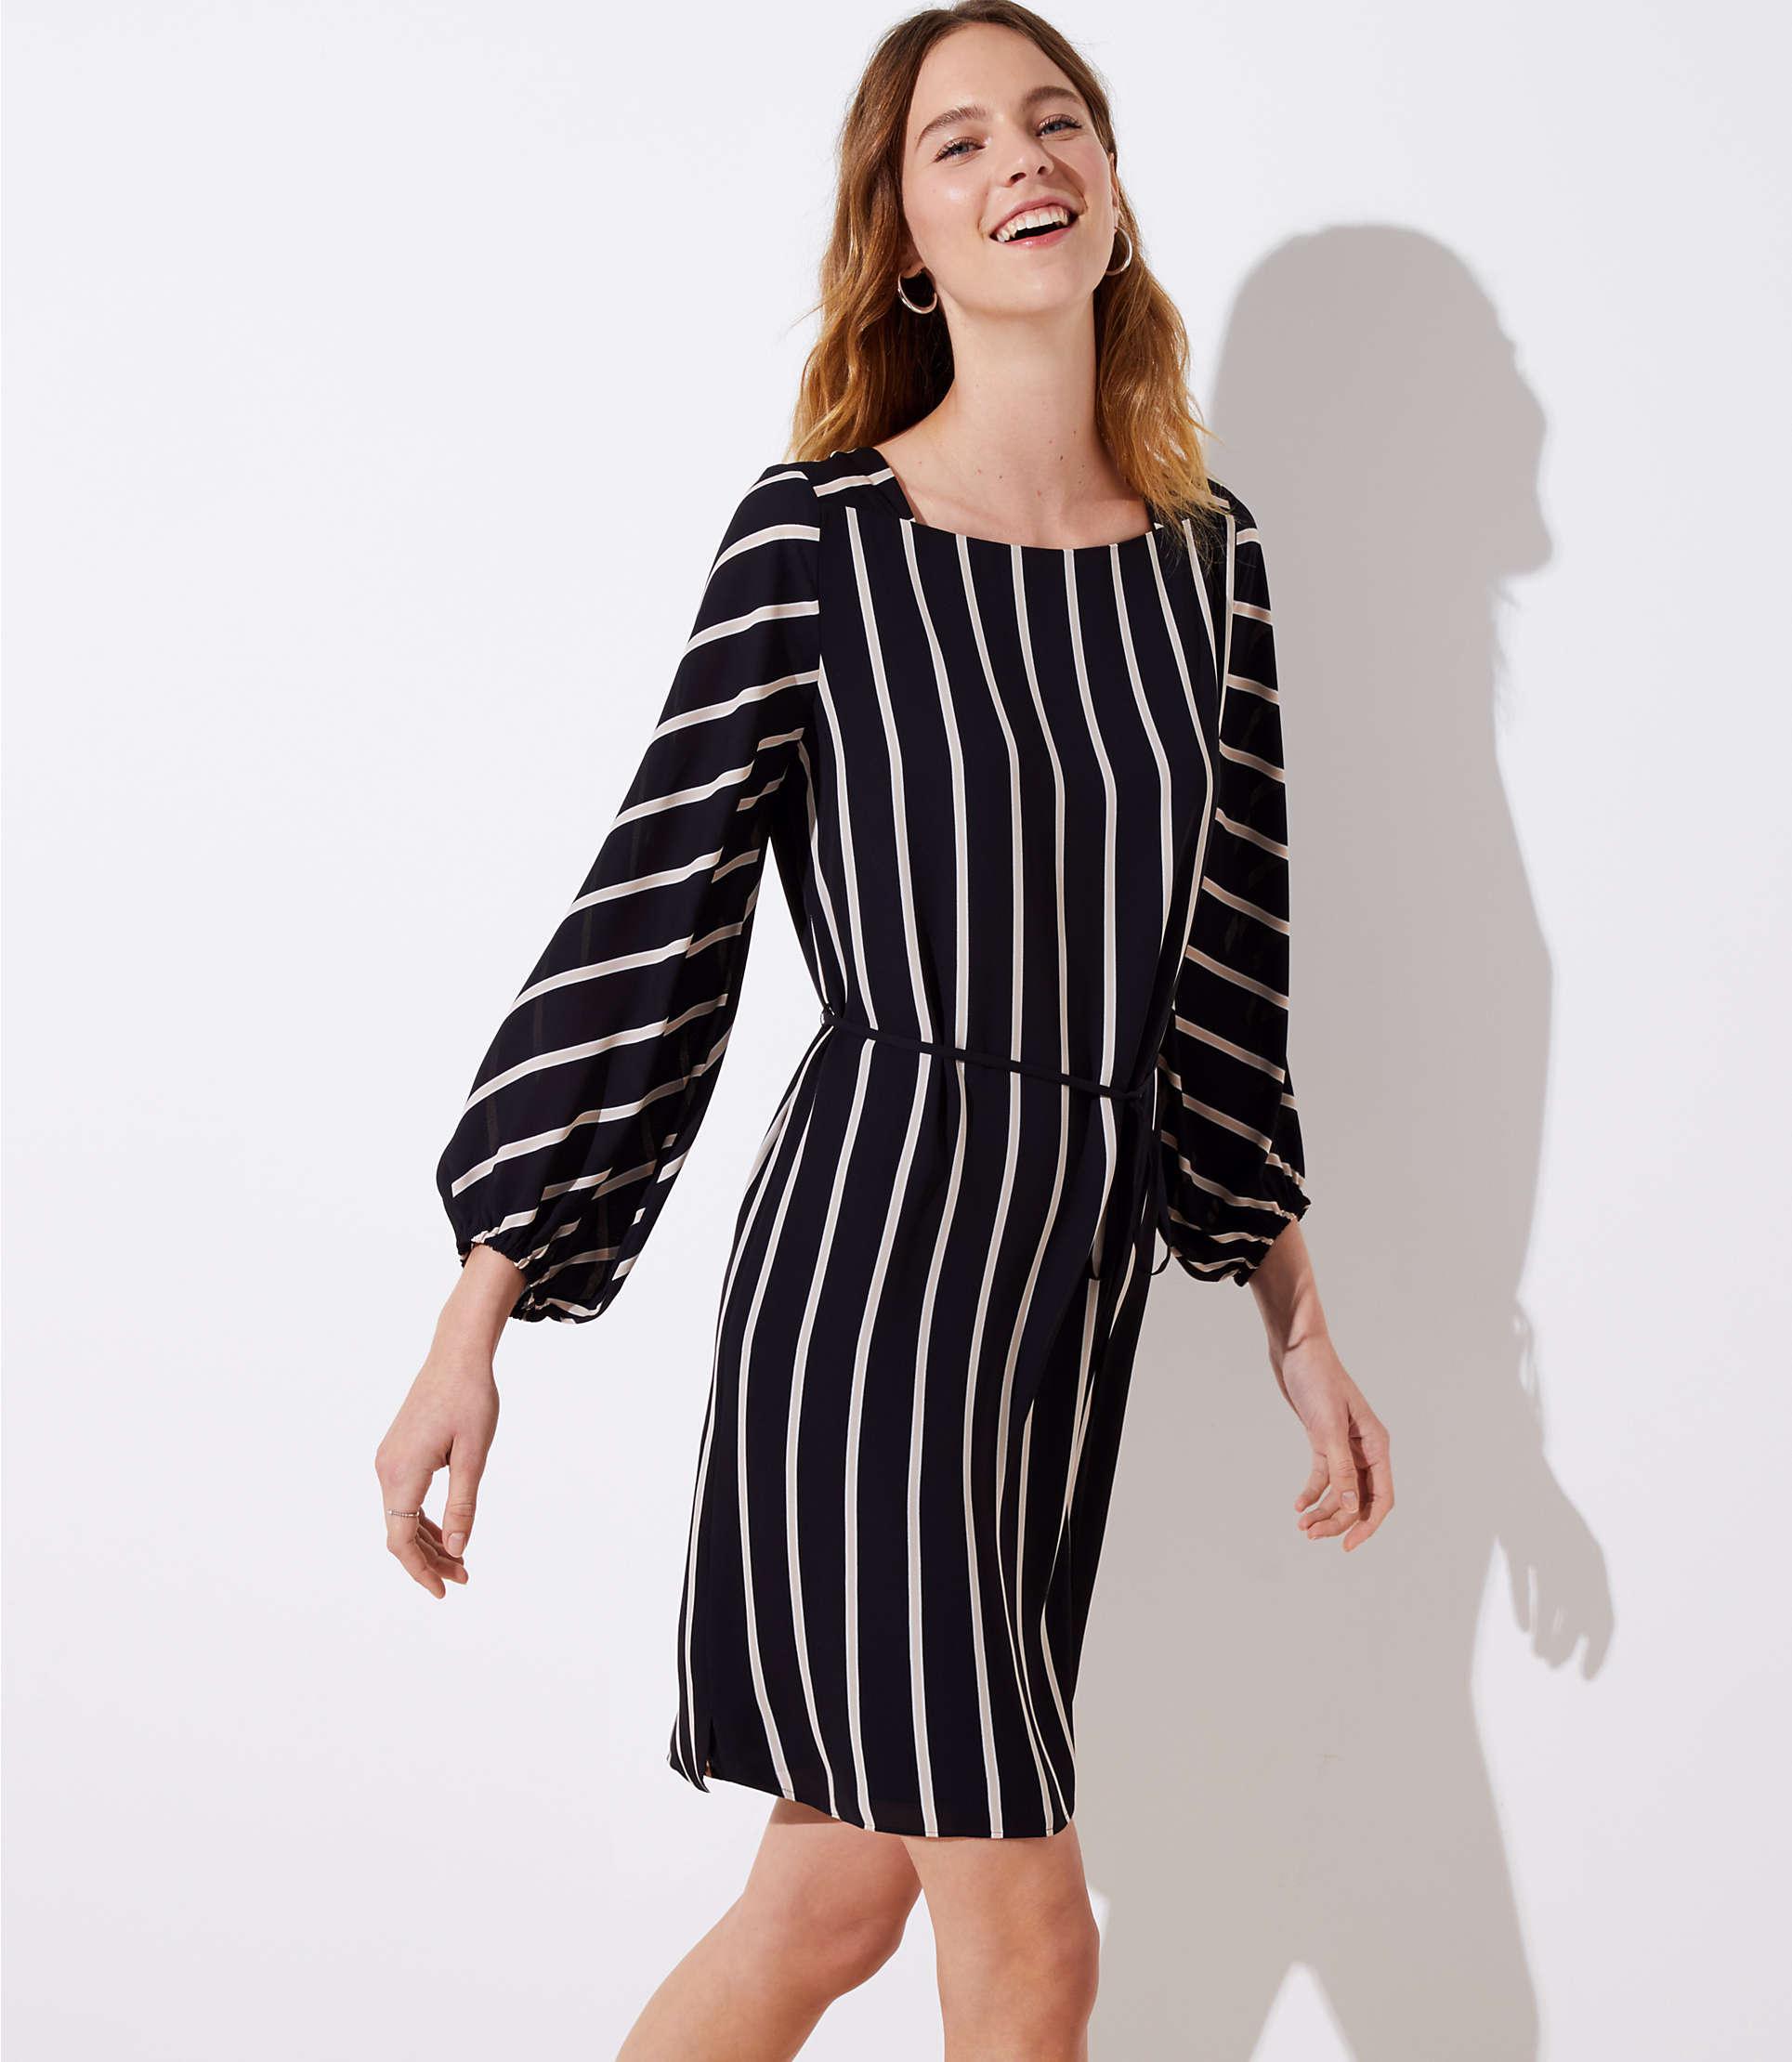 fa87948feb0 LOFT Striped Square Neck Tie Waist Dress in Black - Lyst